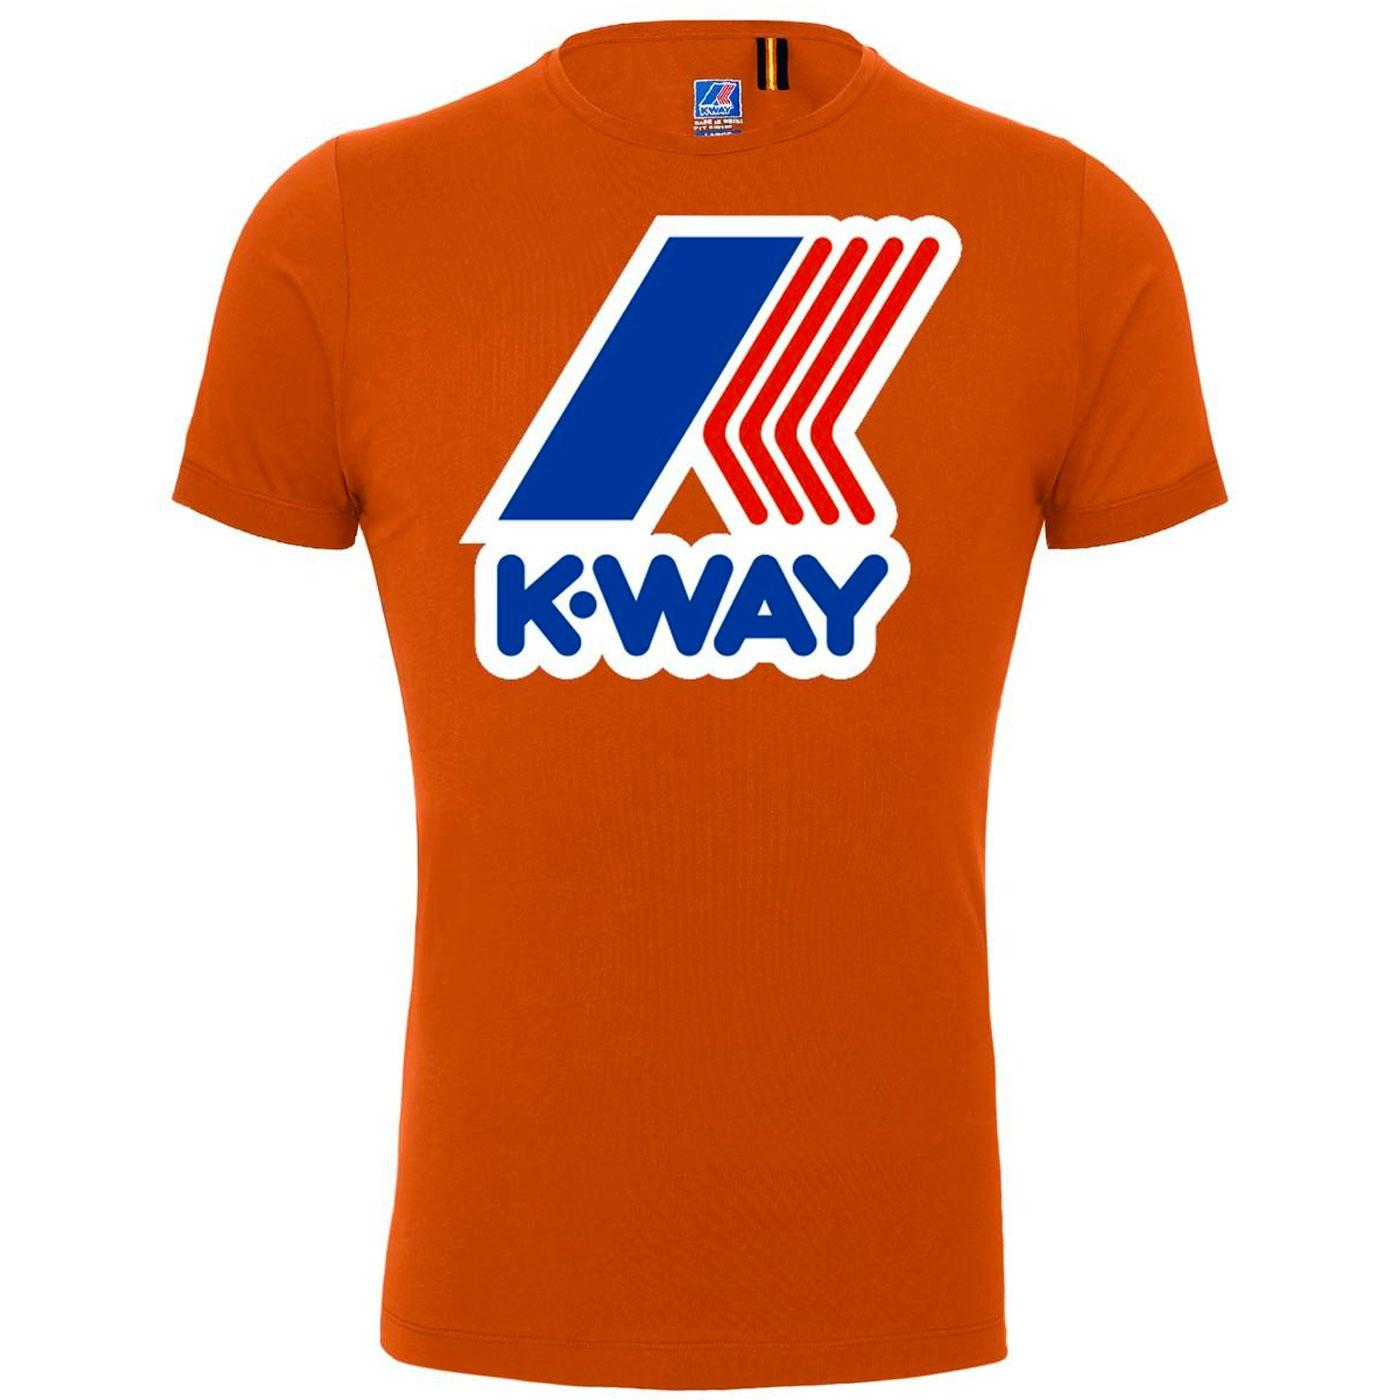 K-WAY Pete Macro Logo Retro 80s Tee (Dark Orange)